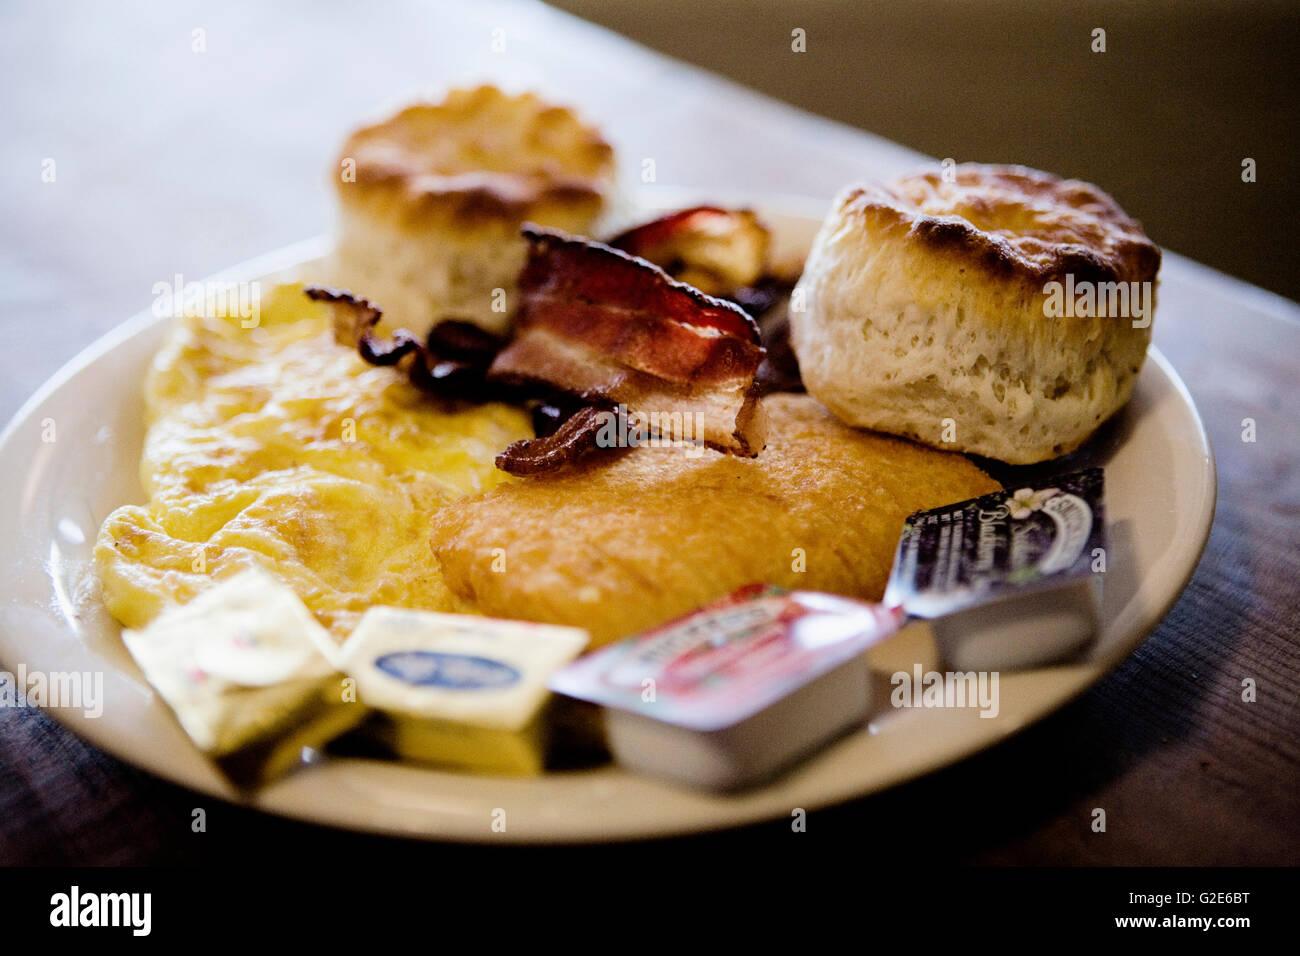 Diner Breakfast - Stock Image